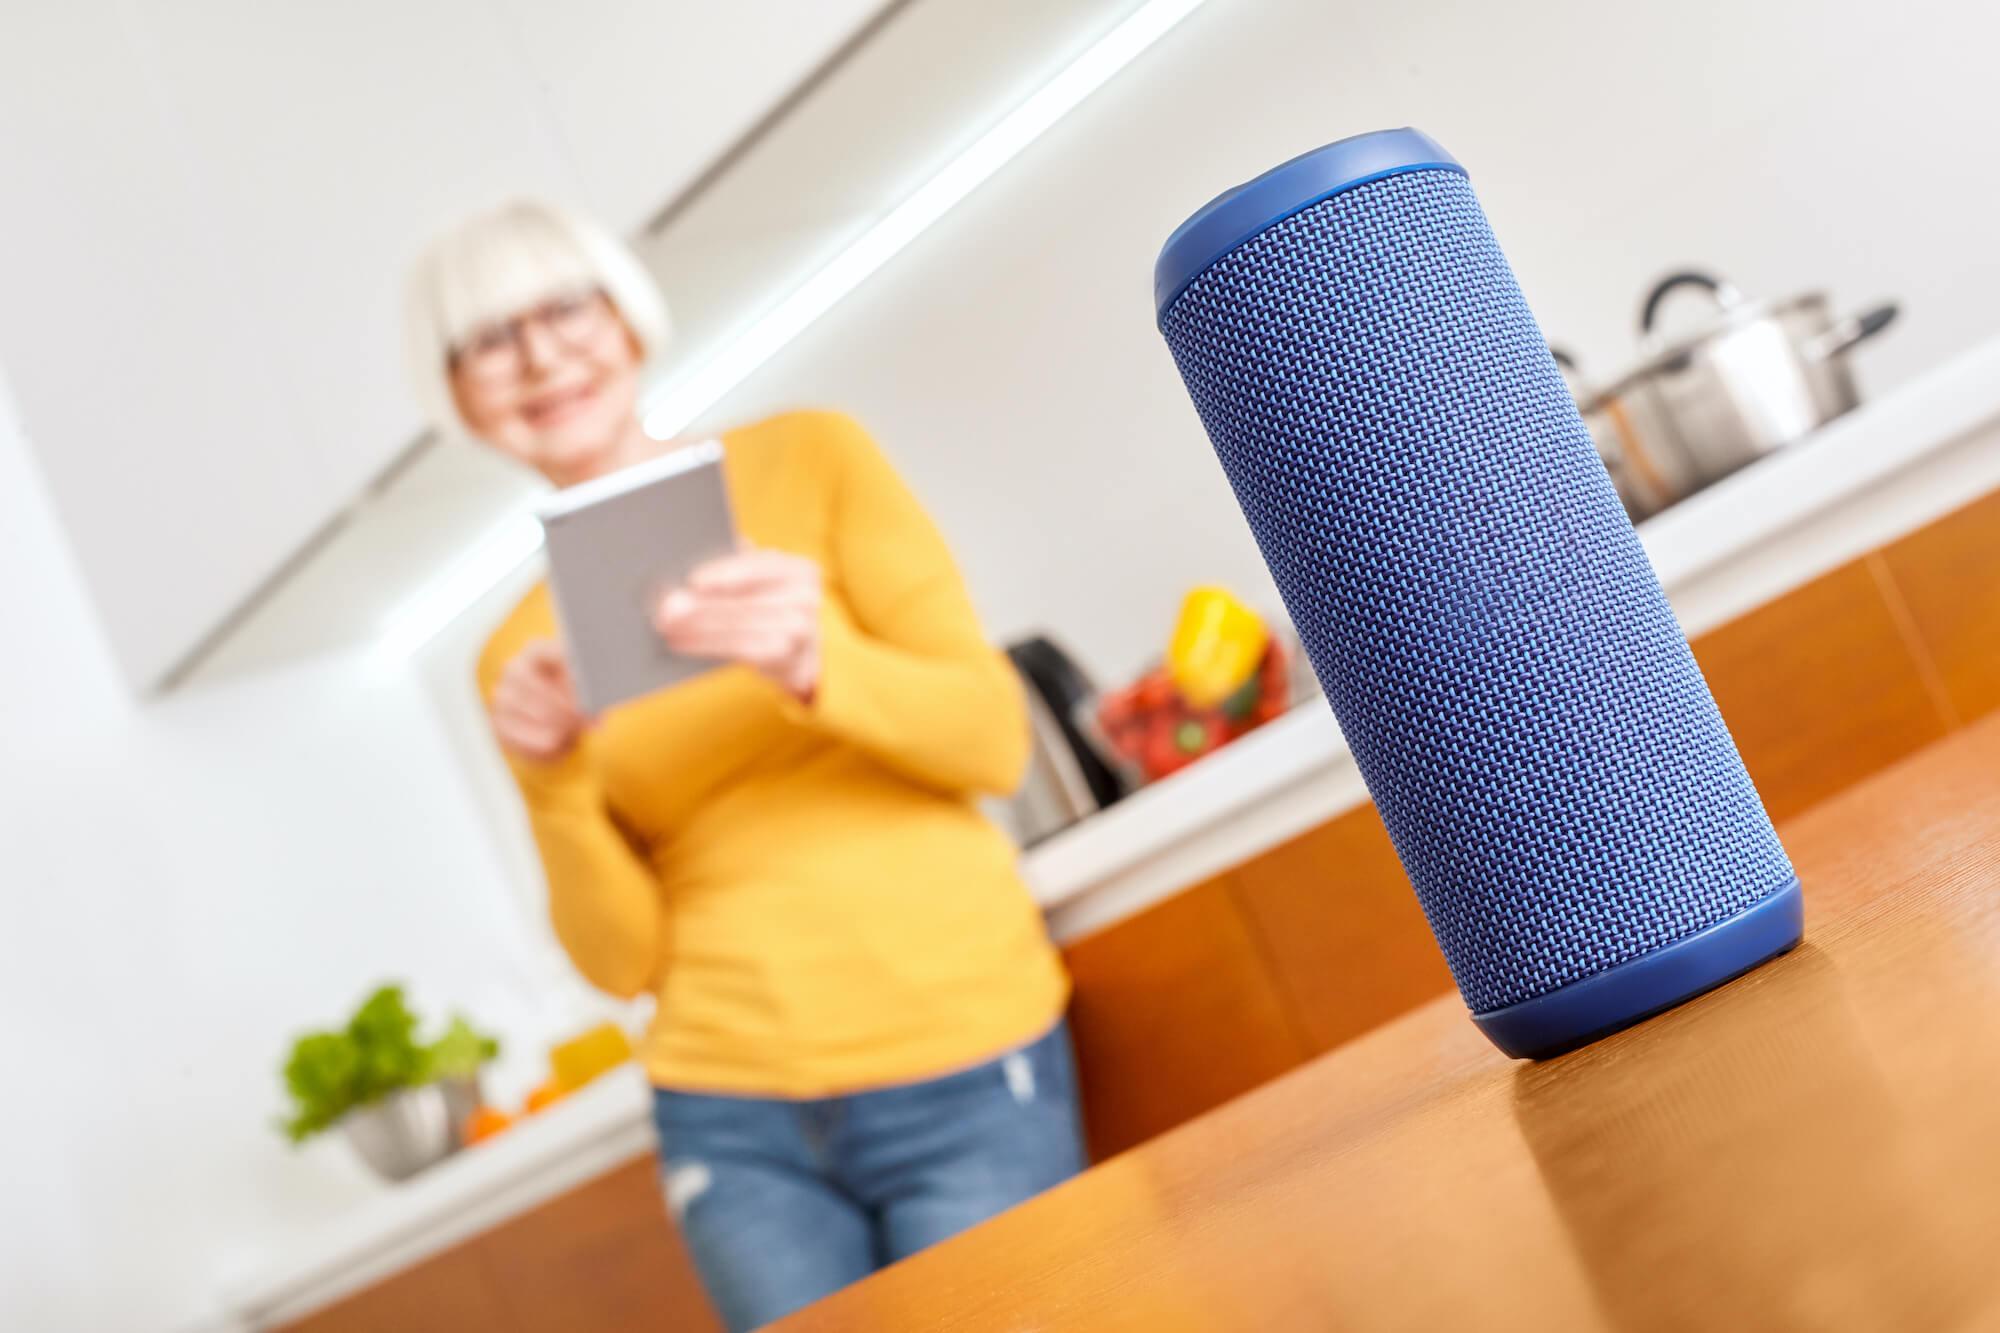 mature-woman-smart-speaker-kitchen-yellow-shutterstock_1707515707 (1)